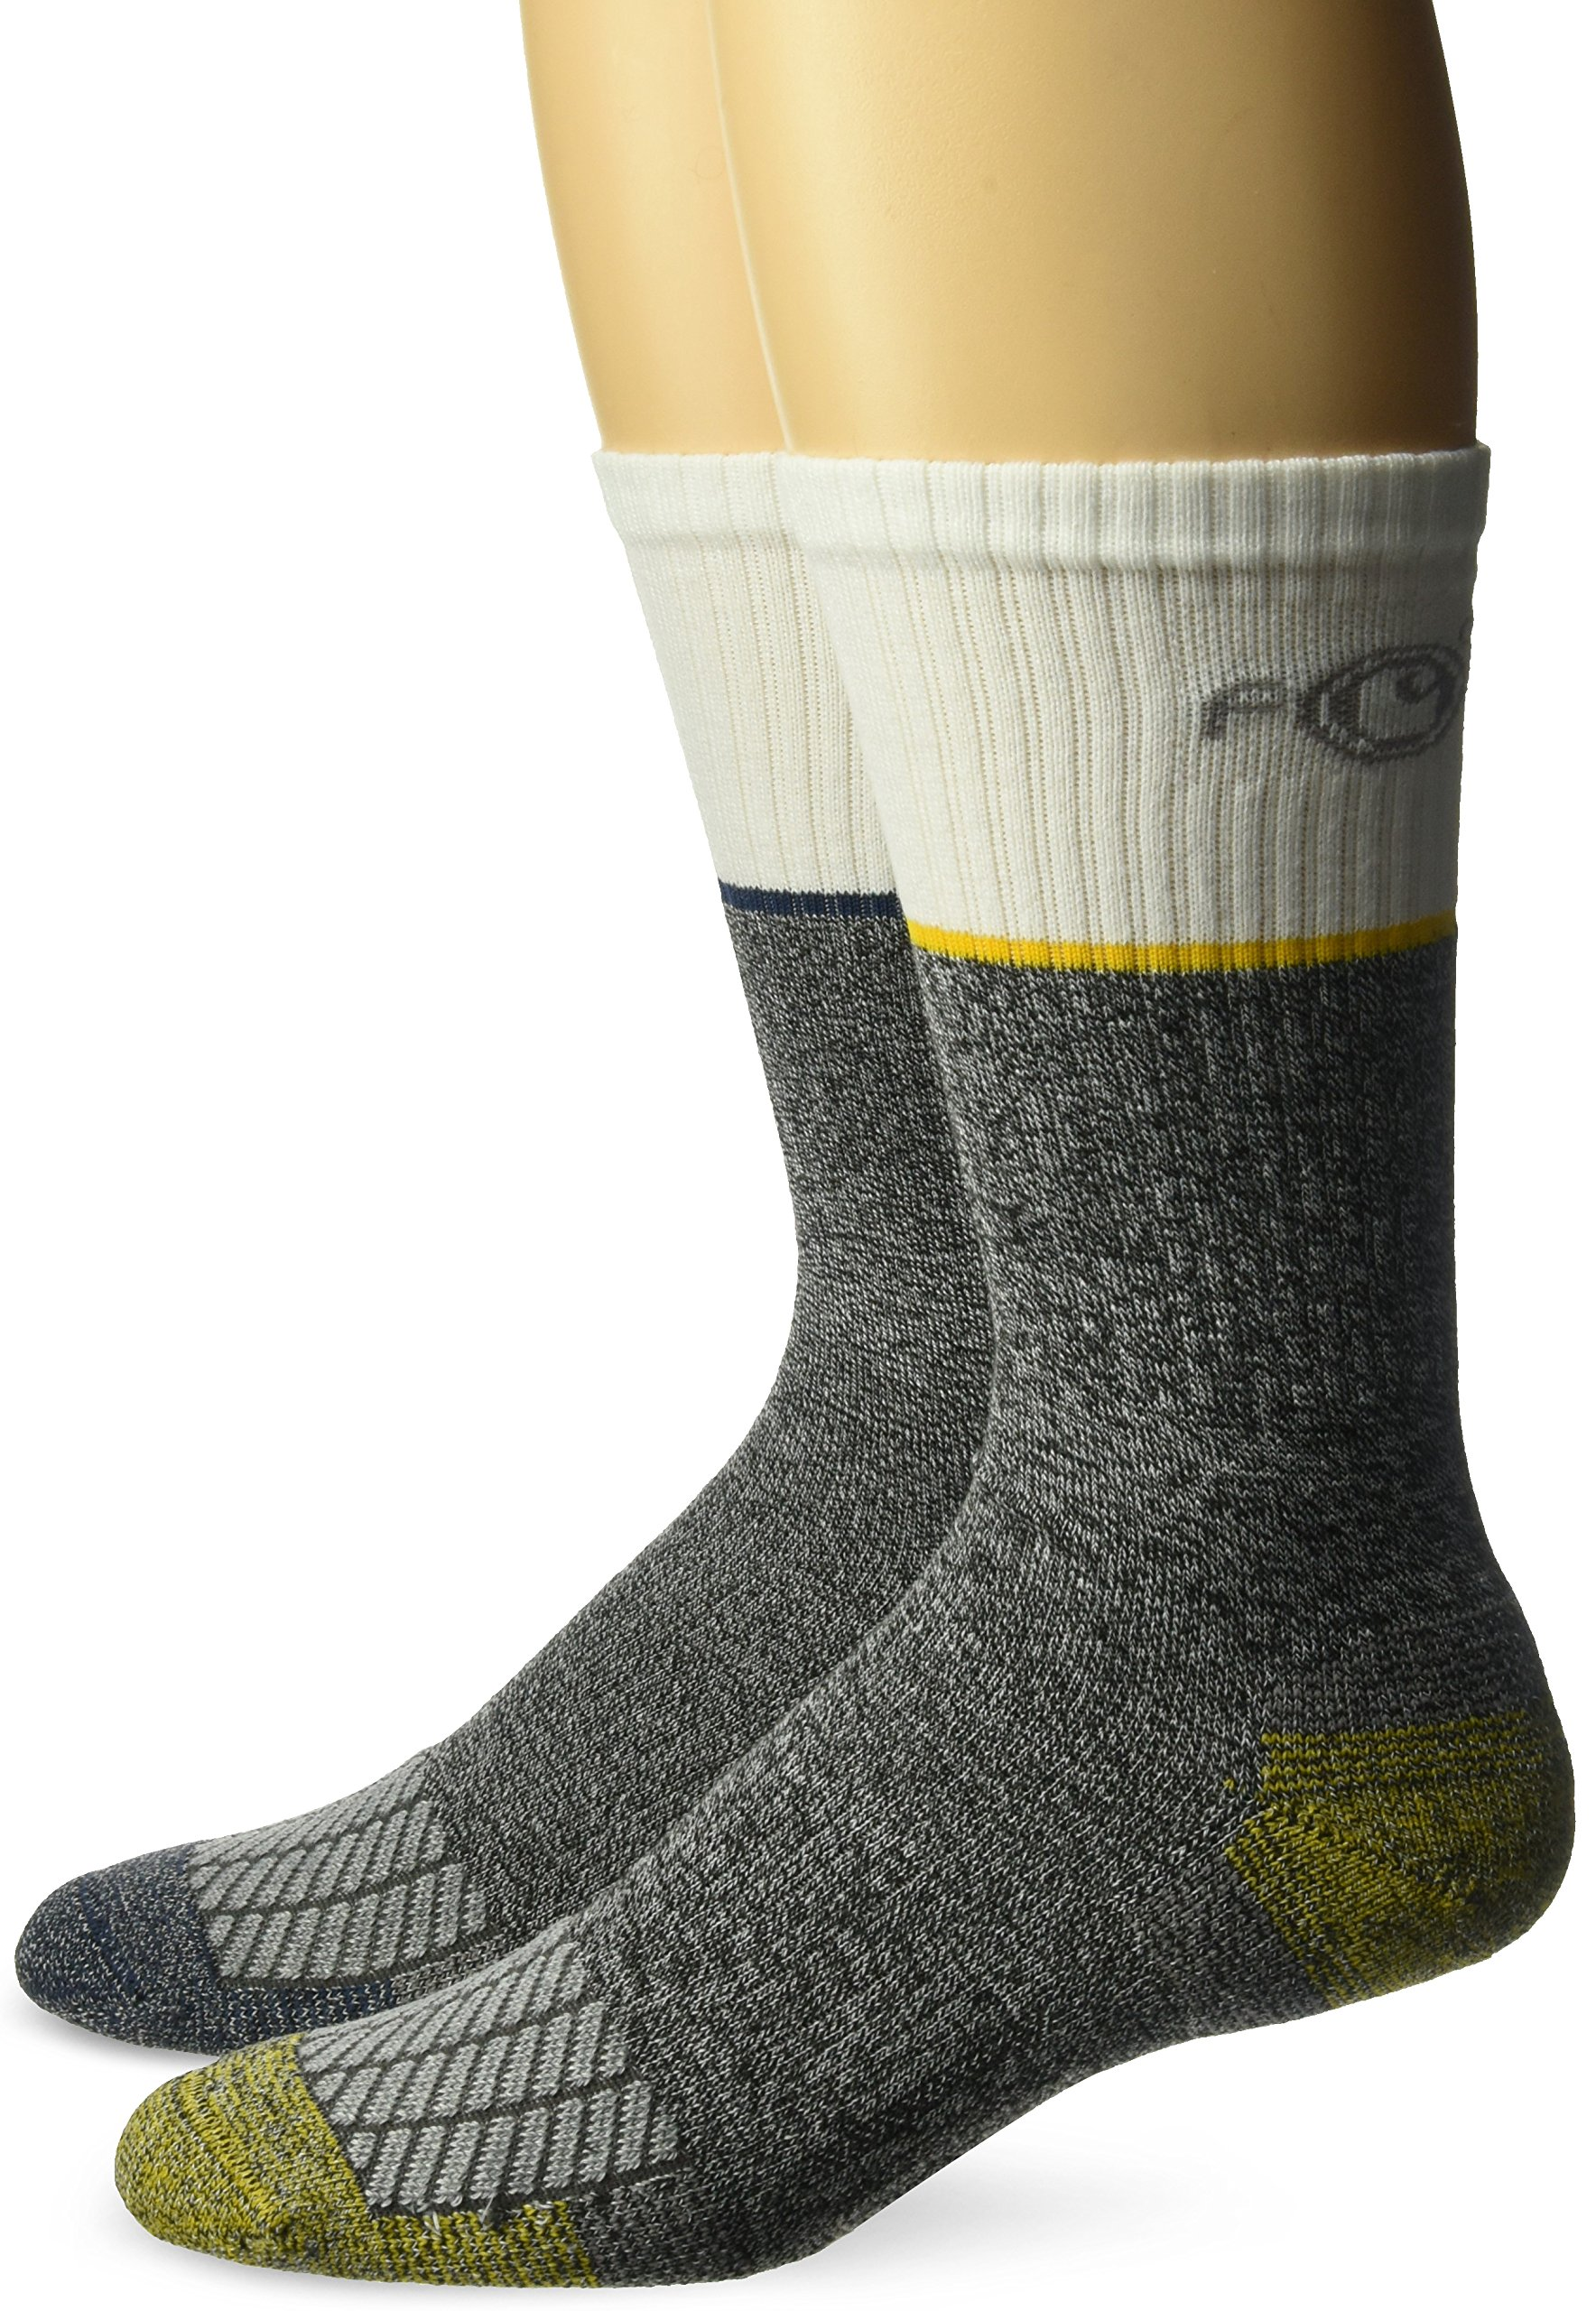 Carhartt Men's Force Performance Steel Toe Crew Socks-2 Pair, White, Grey, Yellow, Blue, Shoe Size: 6-12 (Large)